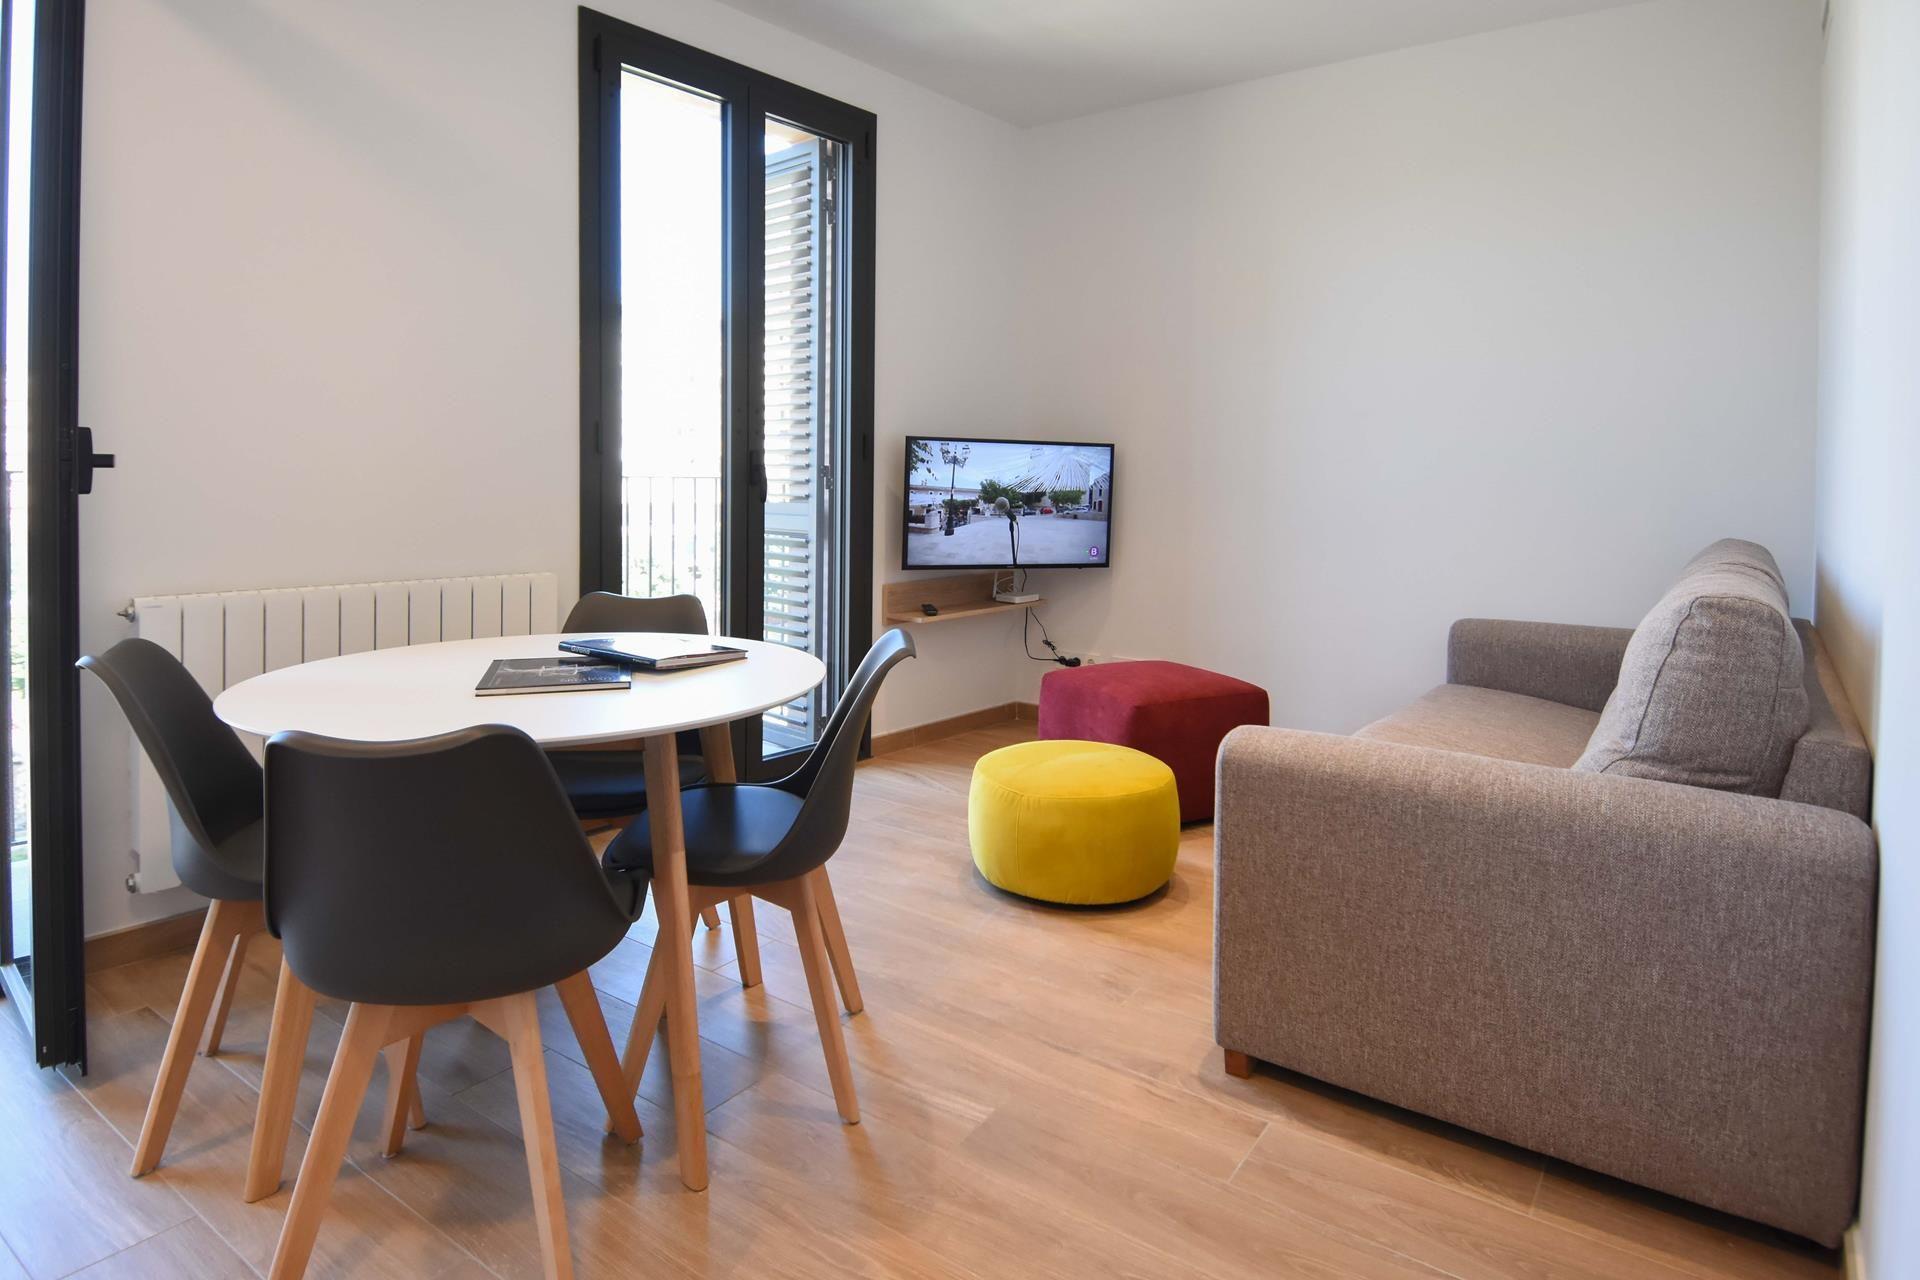 Alquiler Piso  Centro - barri vell. Apartamento  de 2 dormitorios y 1 baño  apartment rentals girona